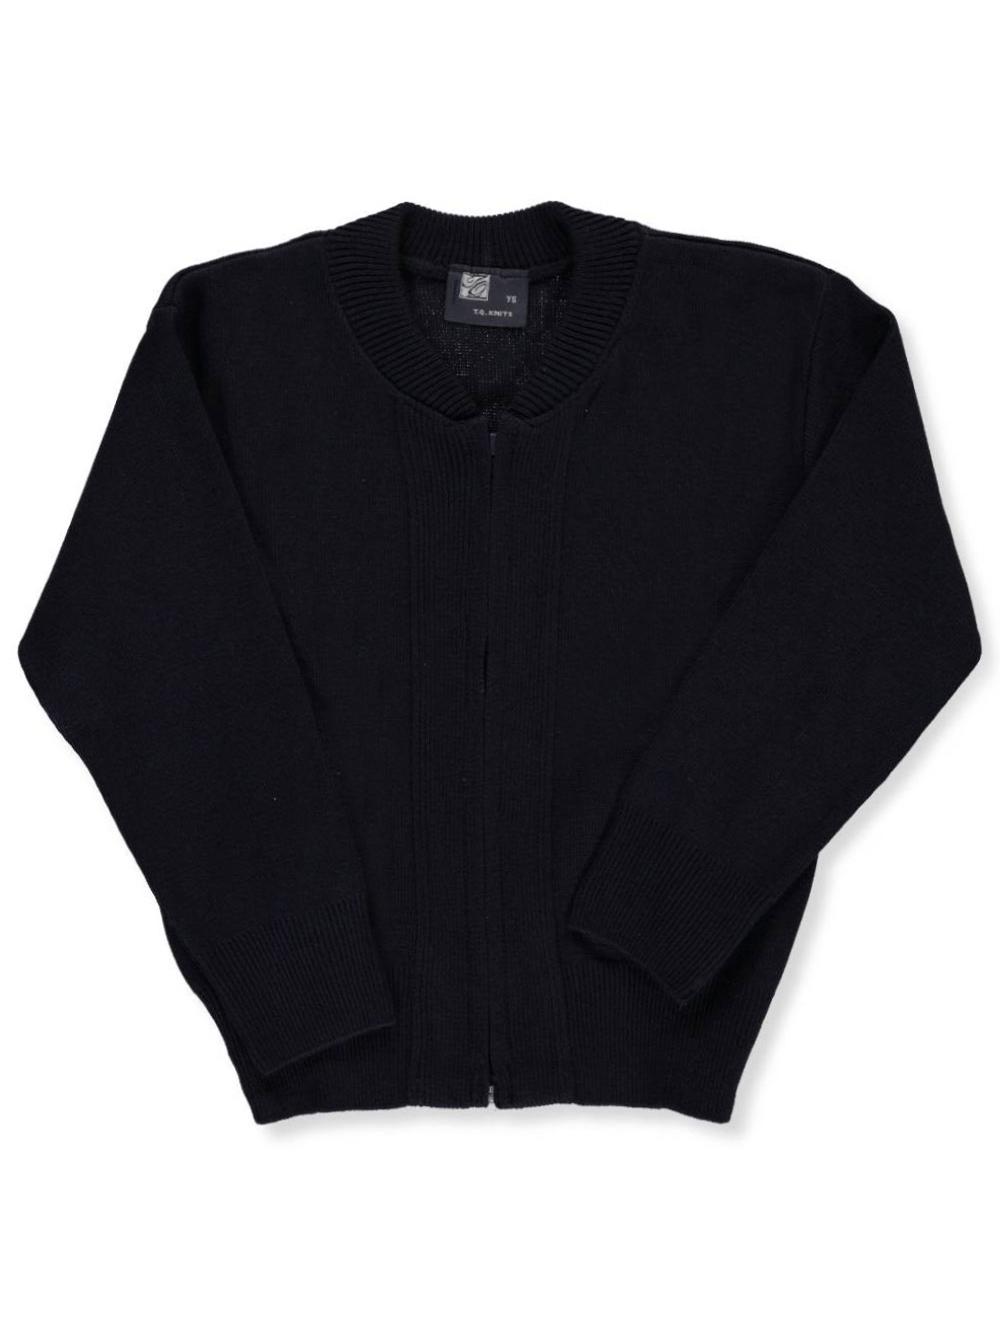 "T.Q. Knits Big Boys' ""Ivy"" Zip-Up Sweater (Sizes 8 - 18)"